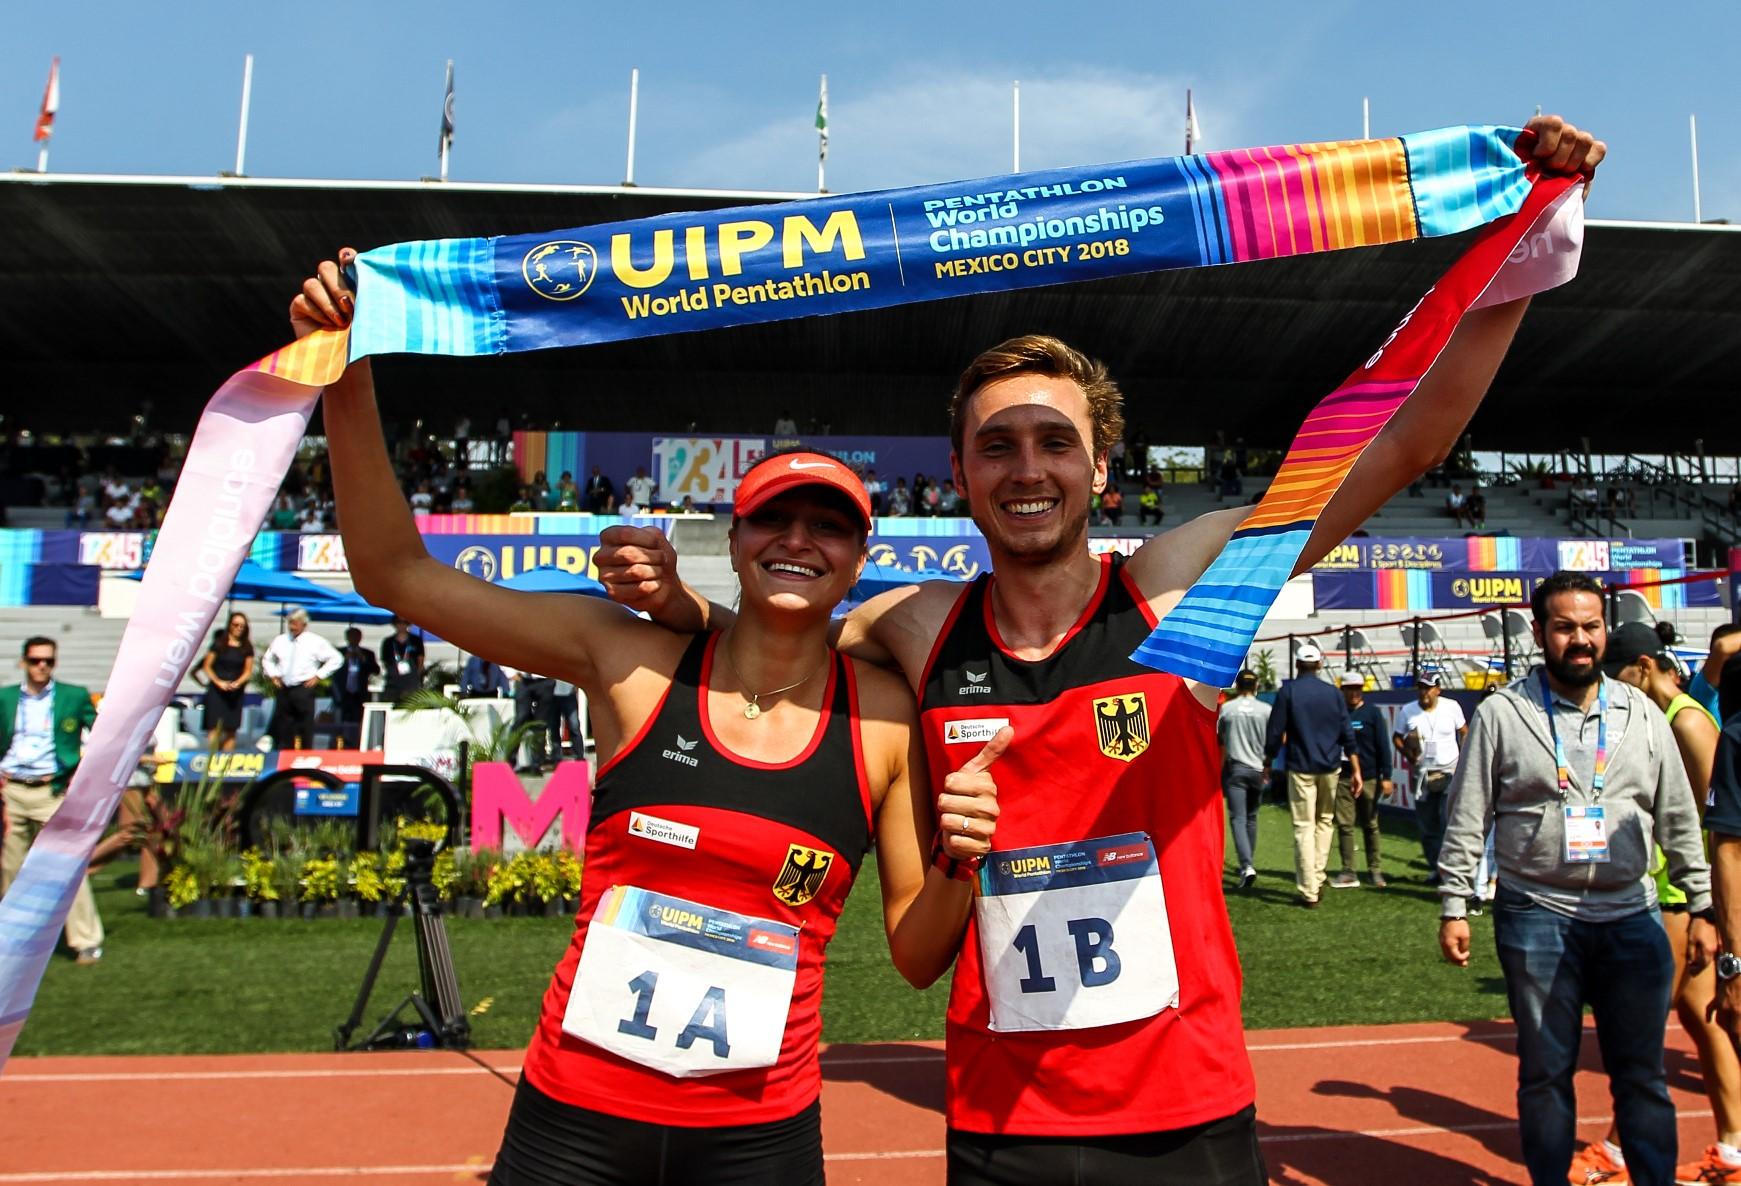 Uipm 2018 Pentathlon World Championships Germany Win